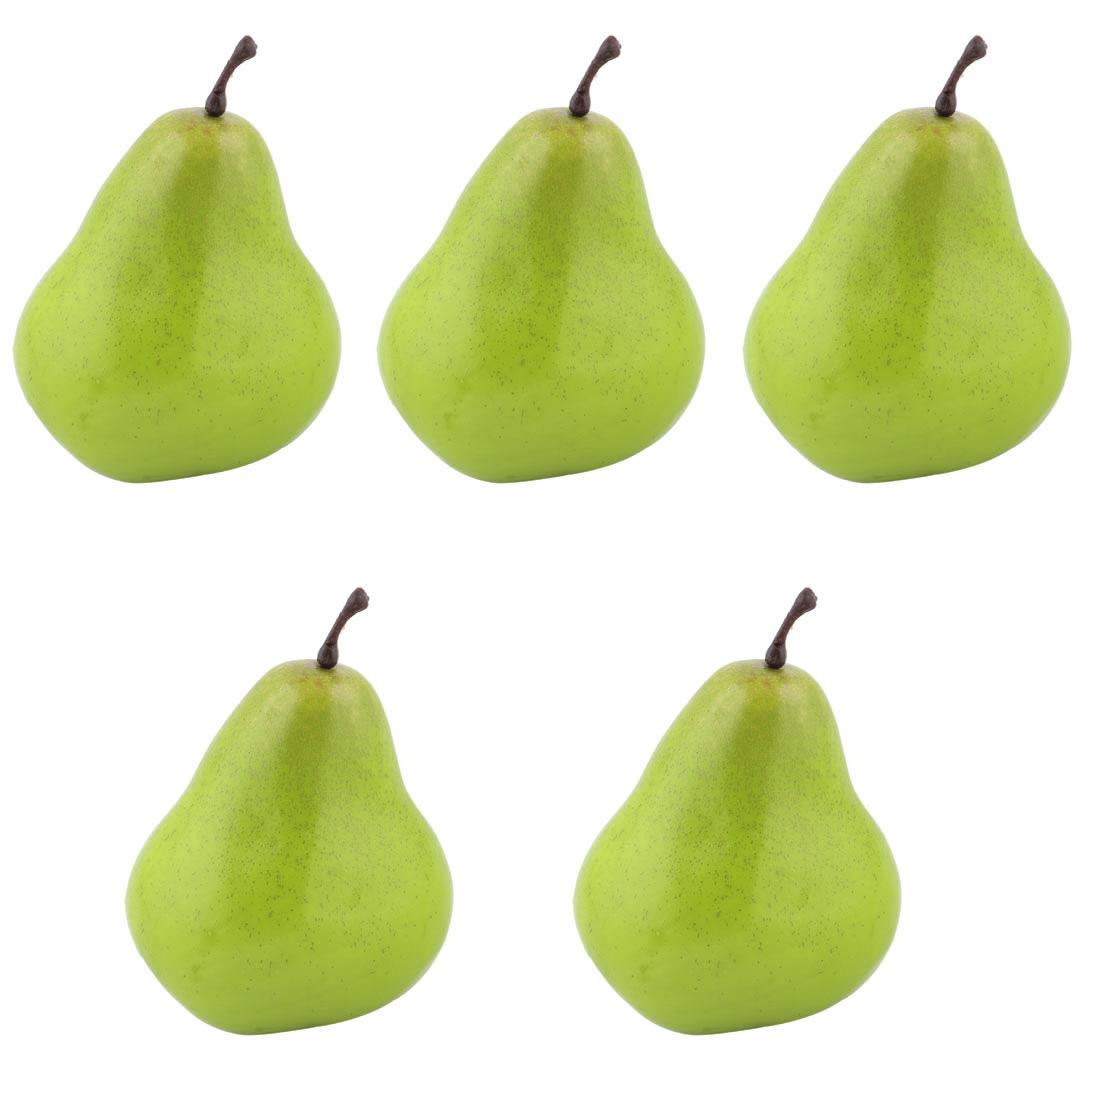 House Table Decor Foam Artificial Pear Designed Emulation Fruit Mold Green 5pcs